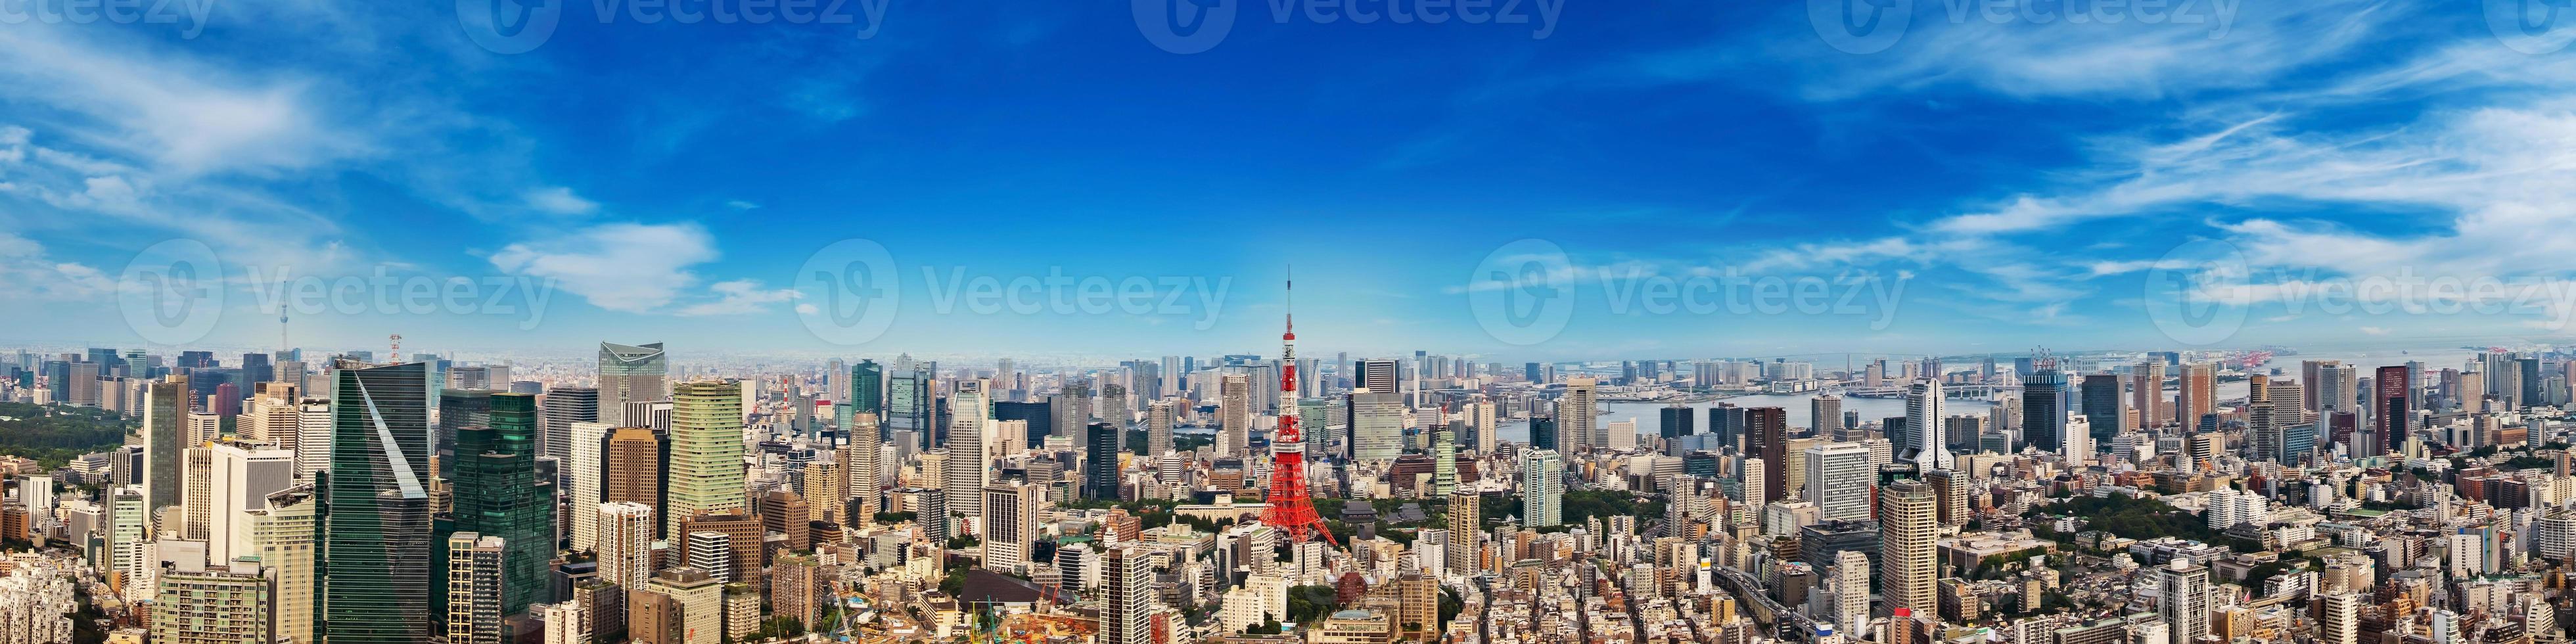 stadsbilden i tokyo japan, asien foto